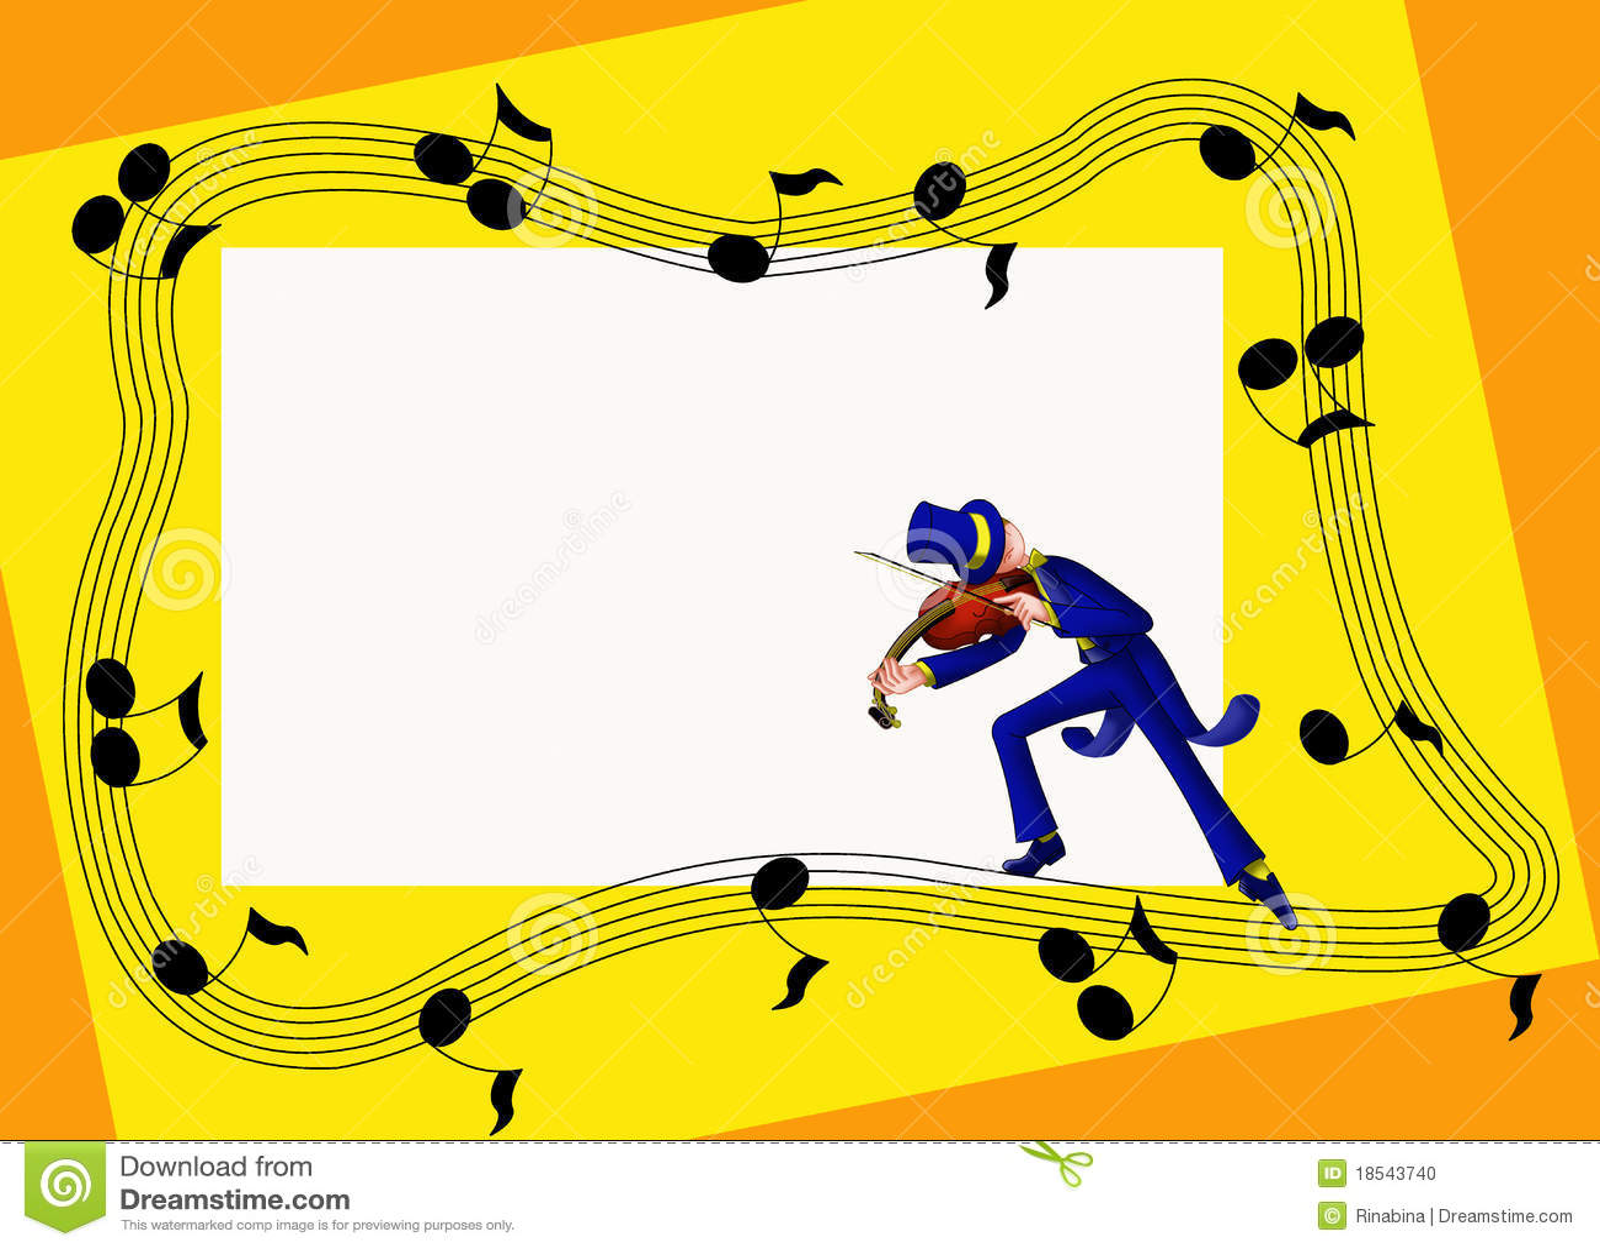 Musical Frame With Violinist Stock Illustration - Illustration of ...